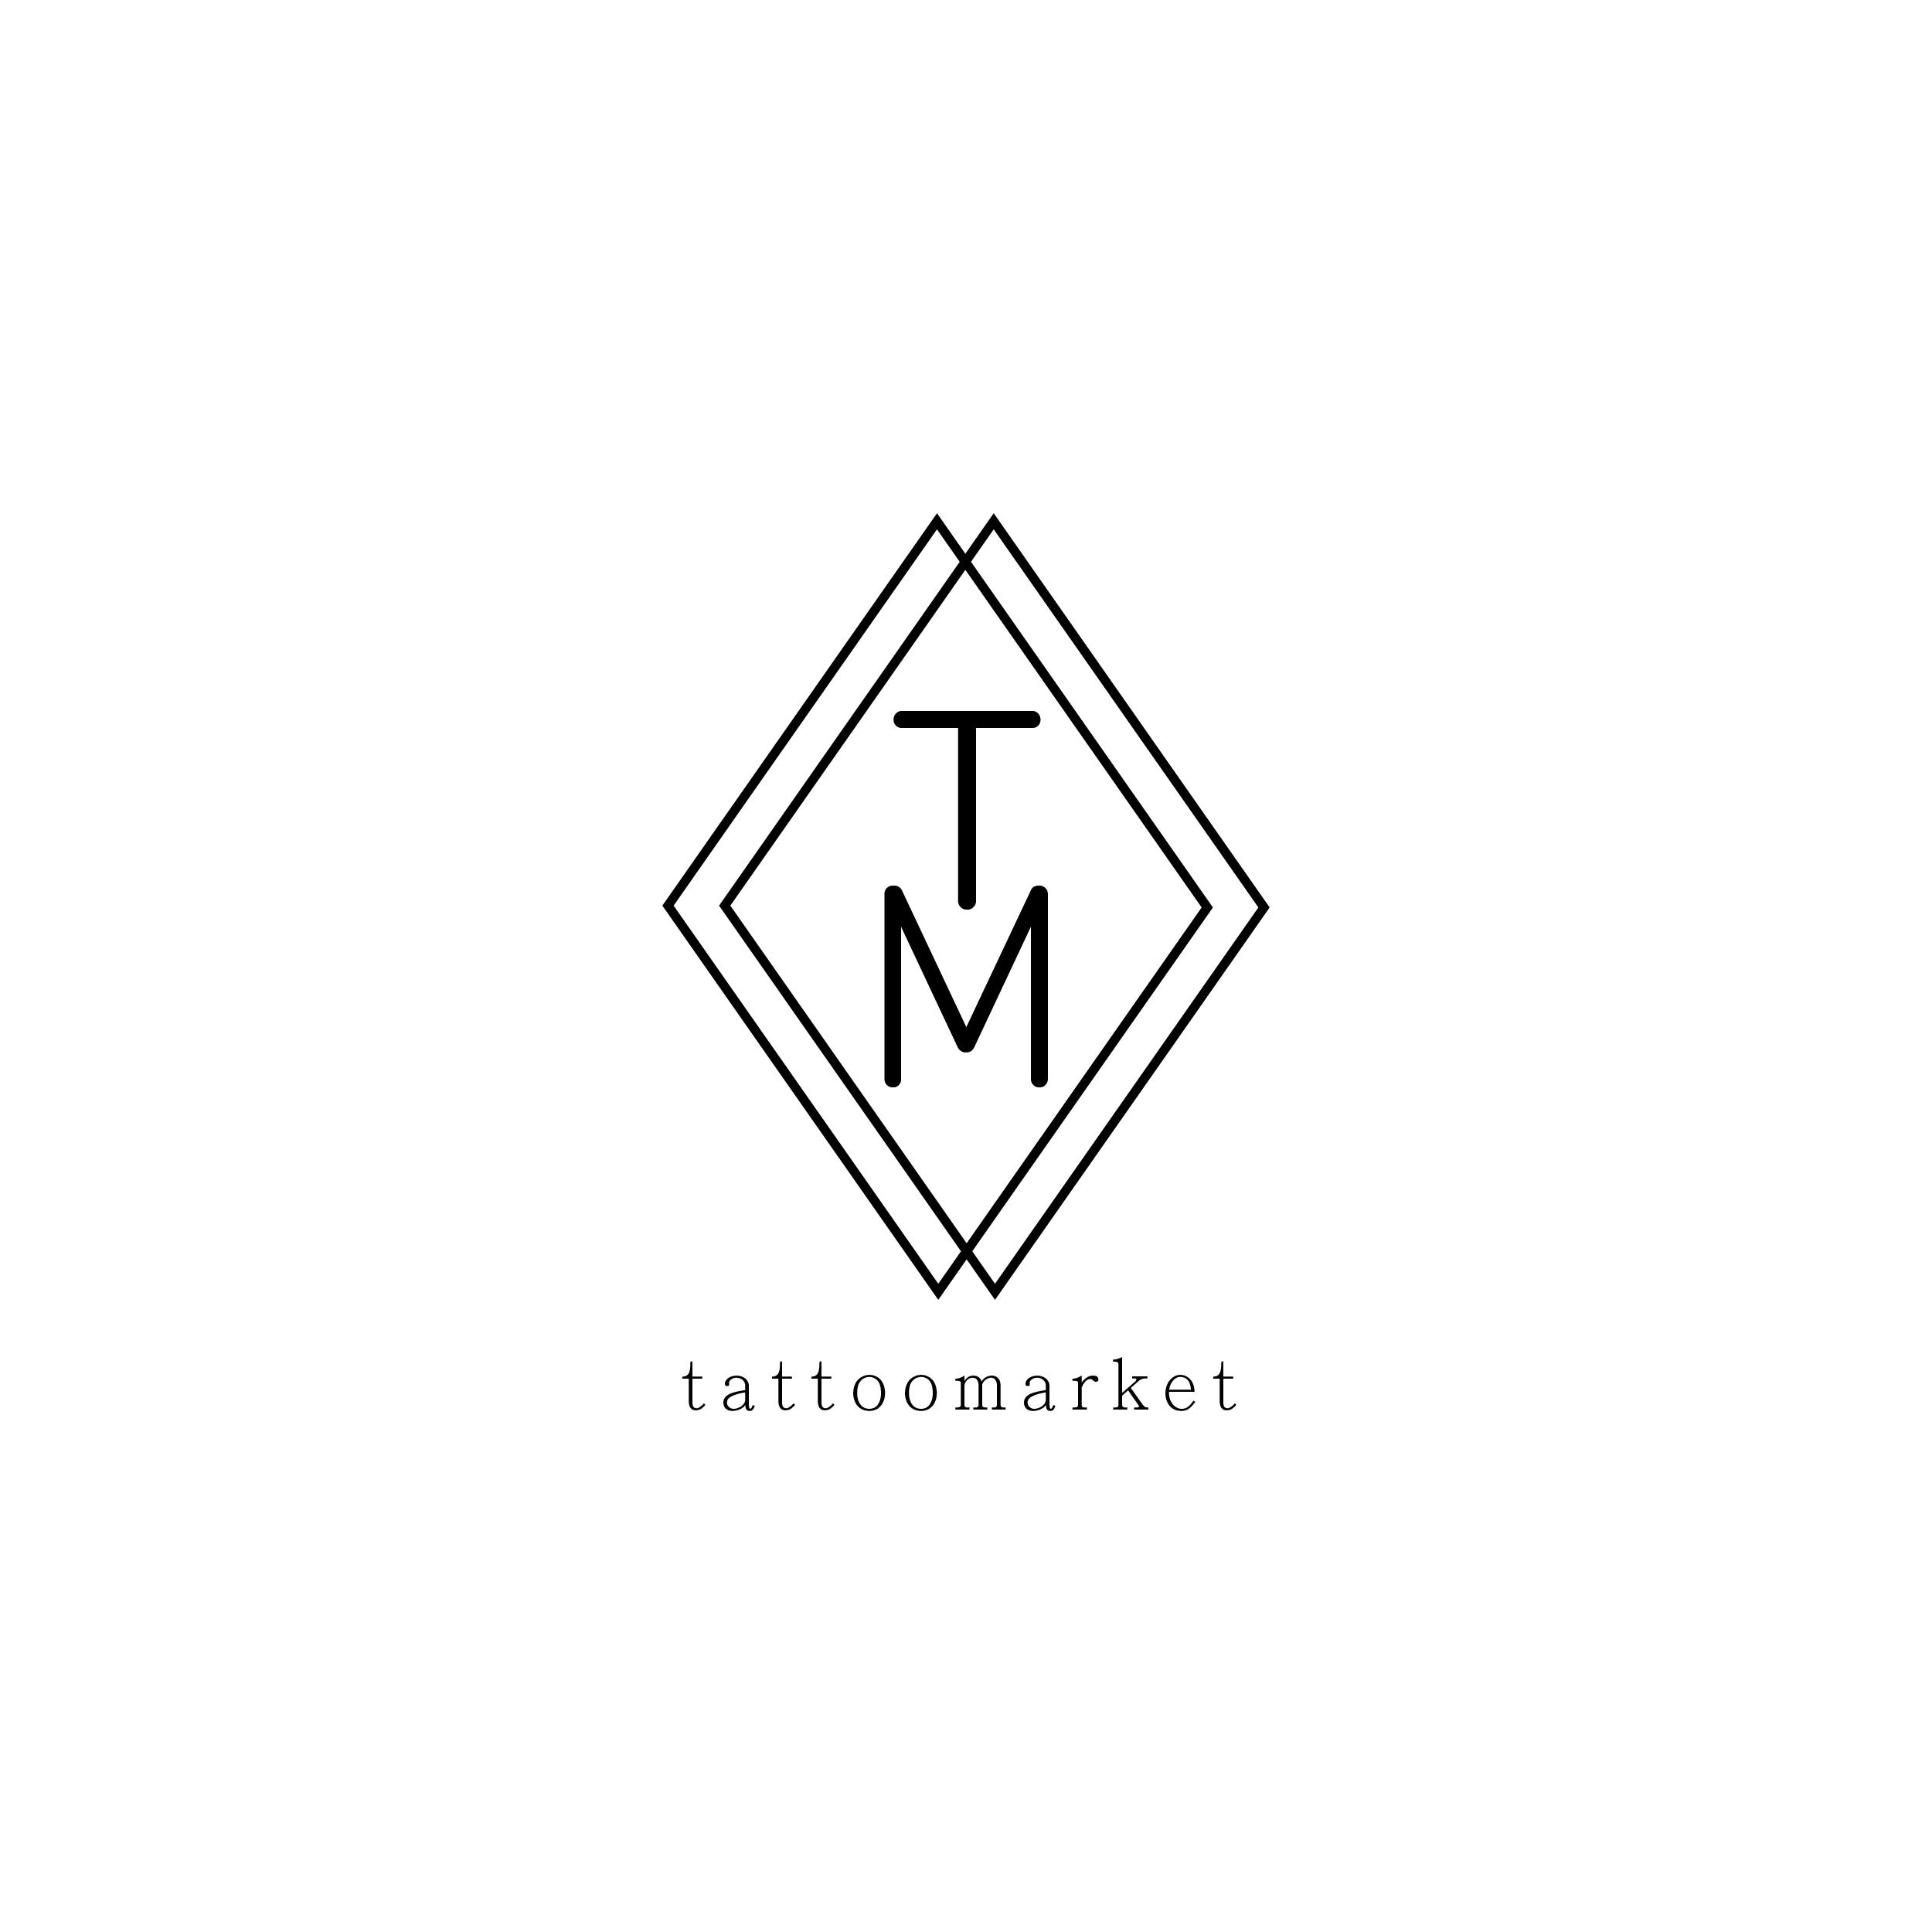 Редизайн логотипа магазина тату оборудования TattooMarket.ru фото f_5255c3b1e5c32414.jpg